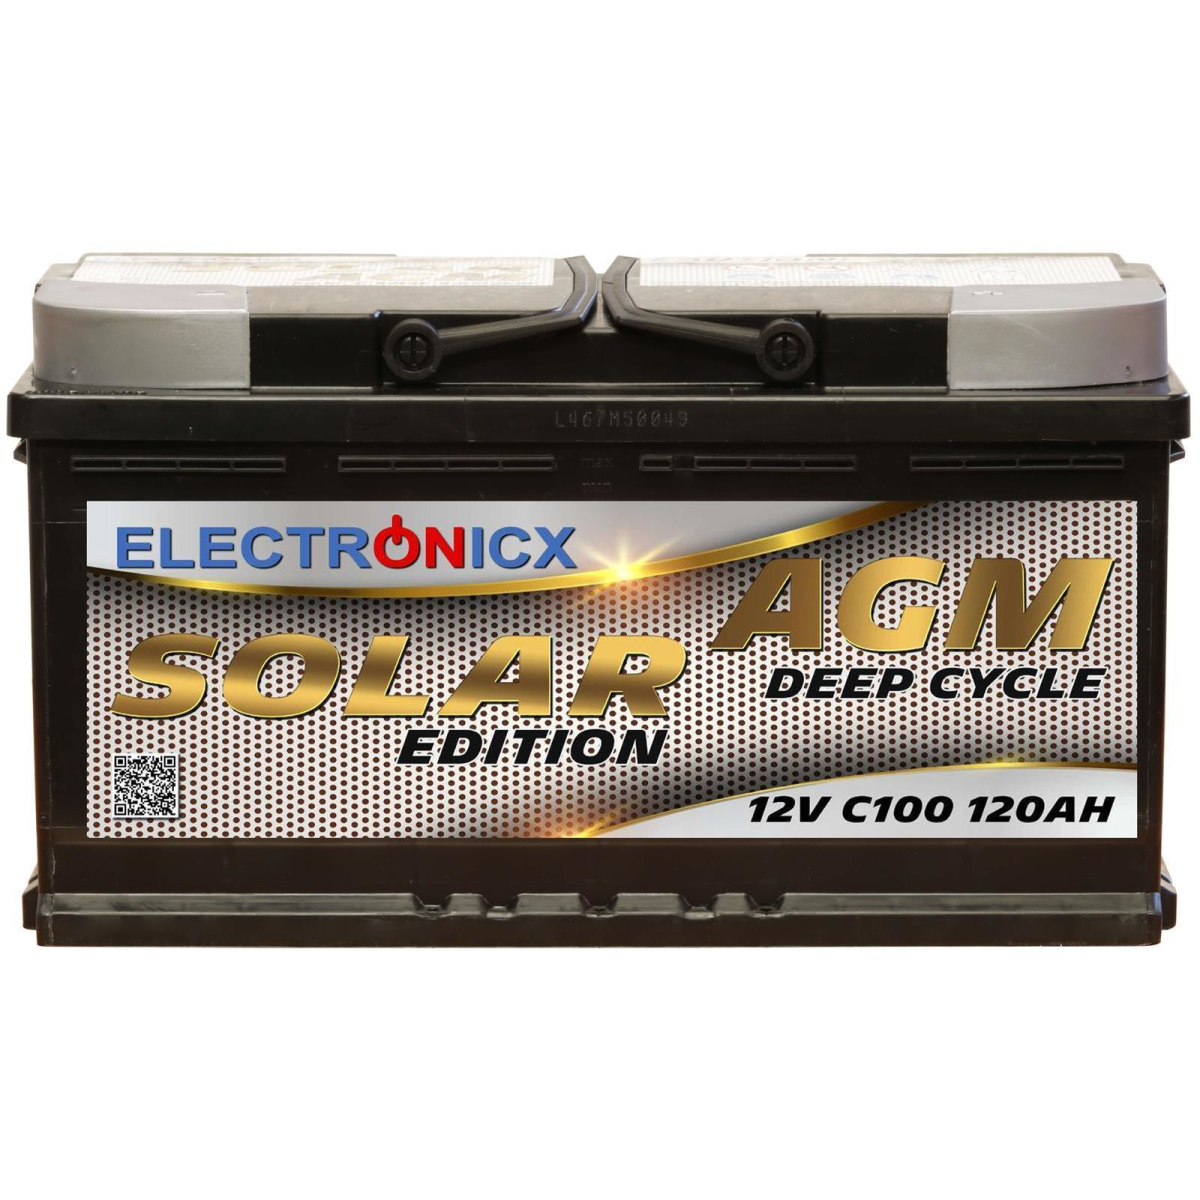 Electronicx solar edition battery agm 120 ah 12v solar supply solar battery